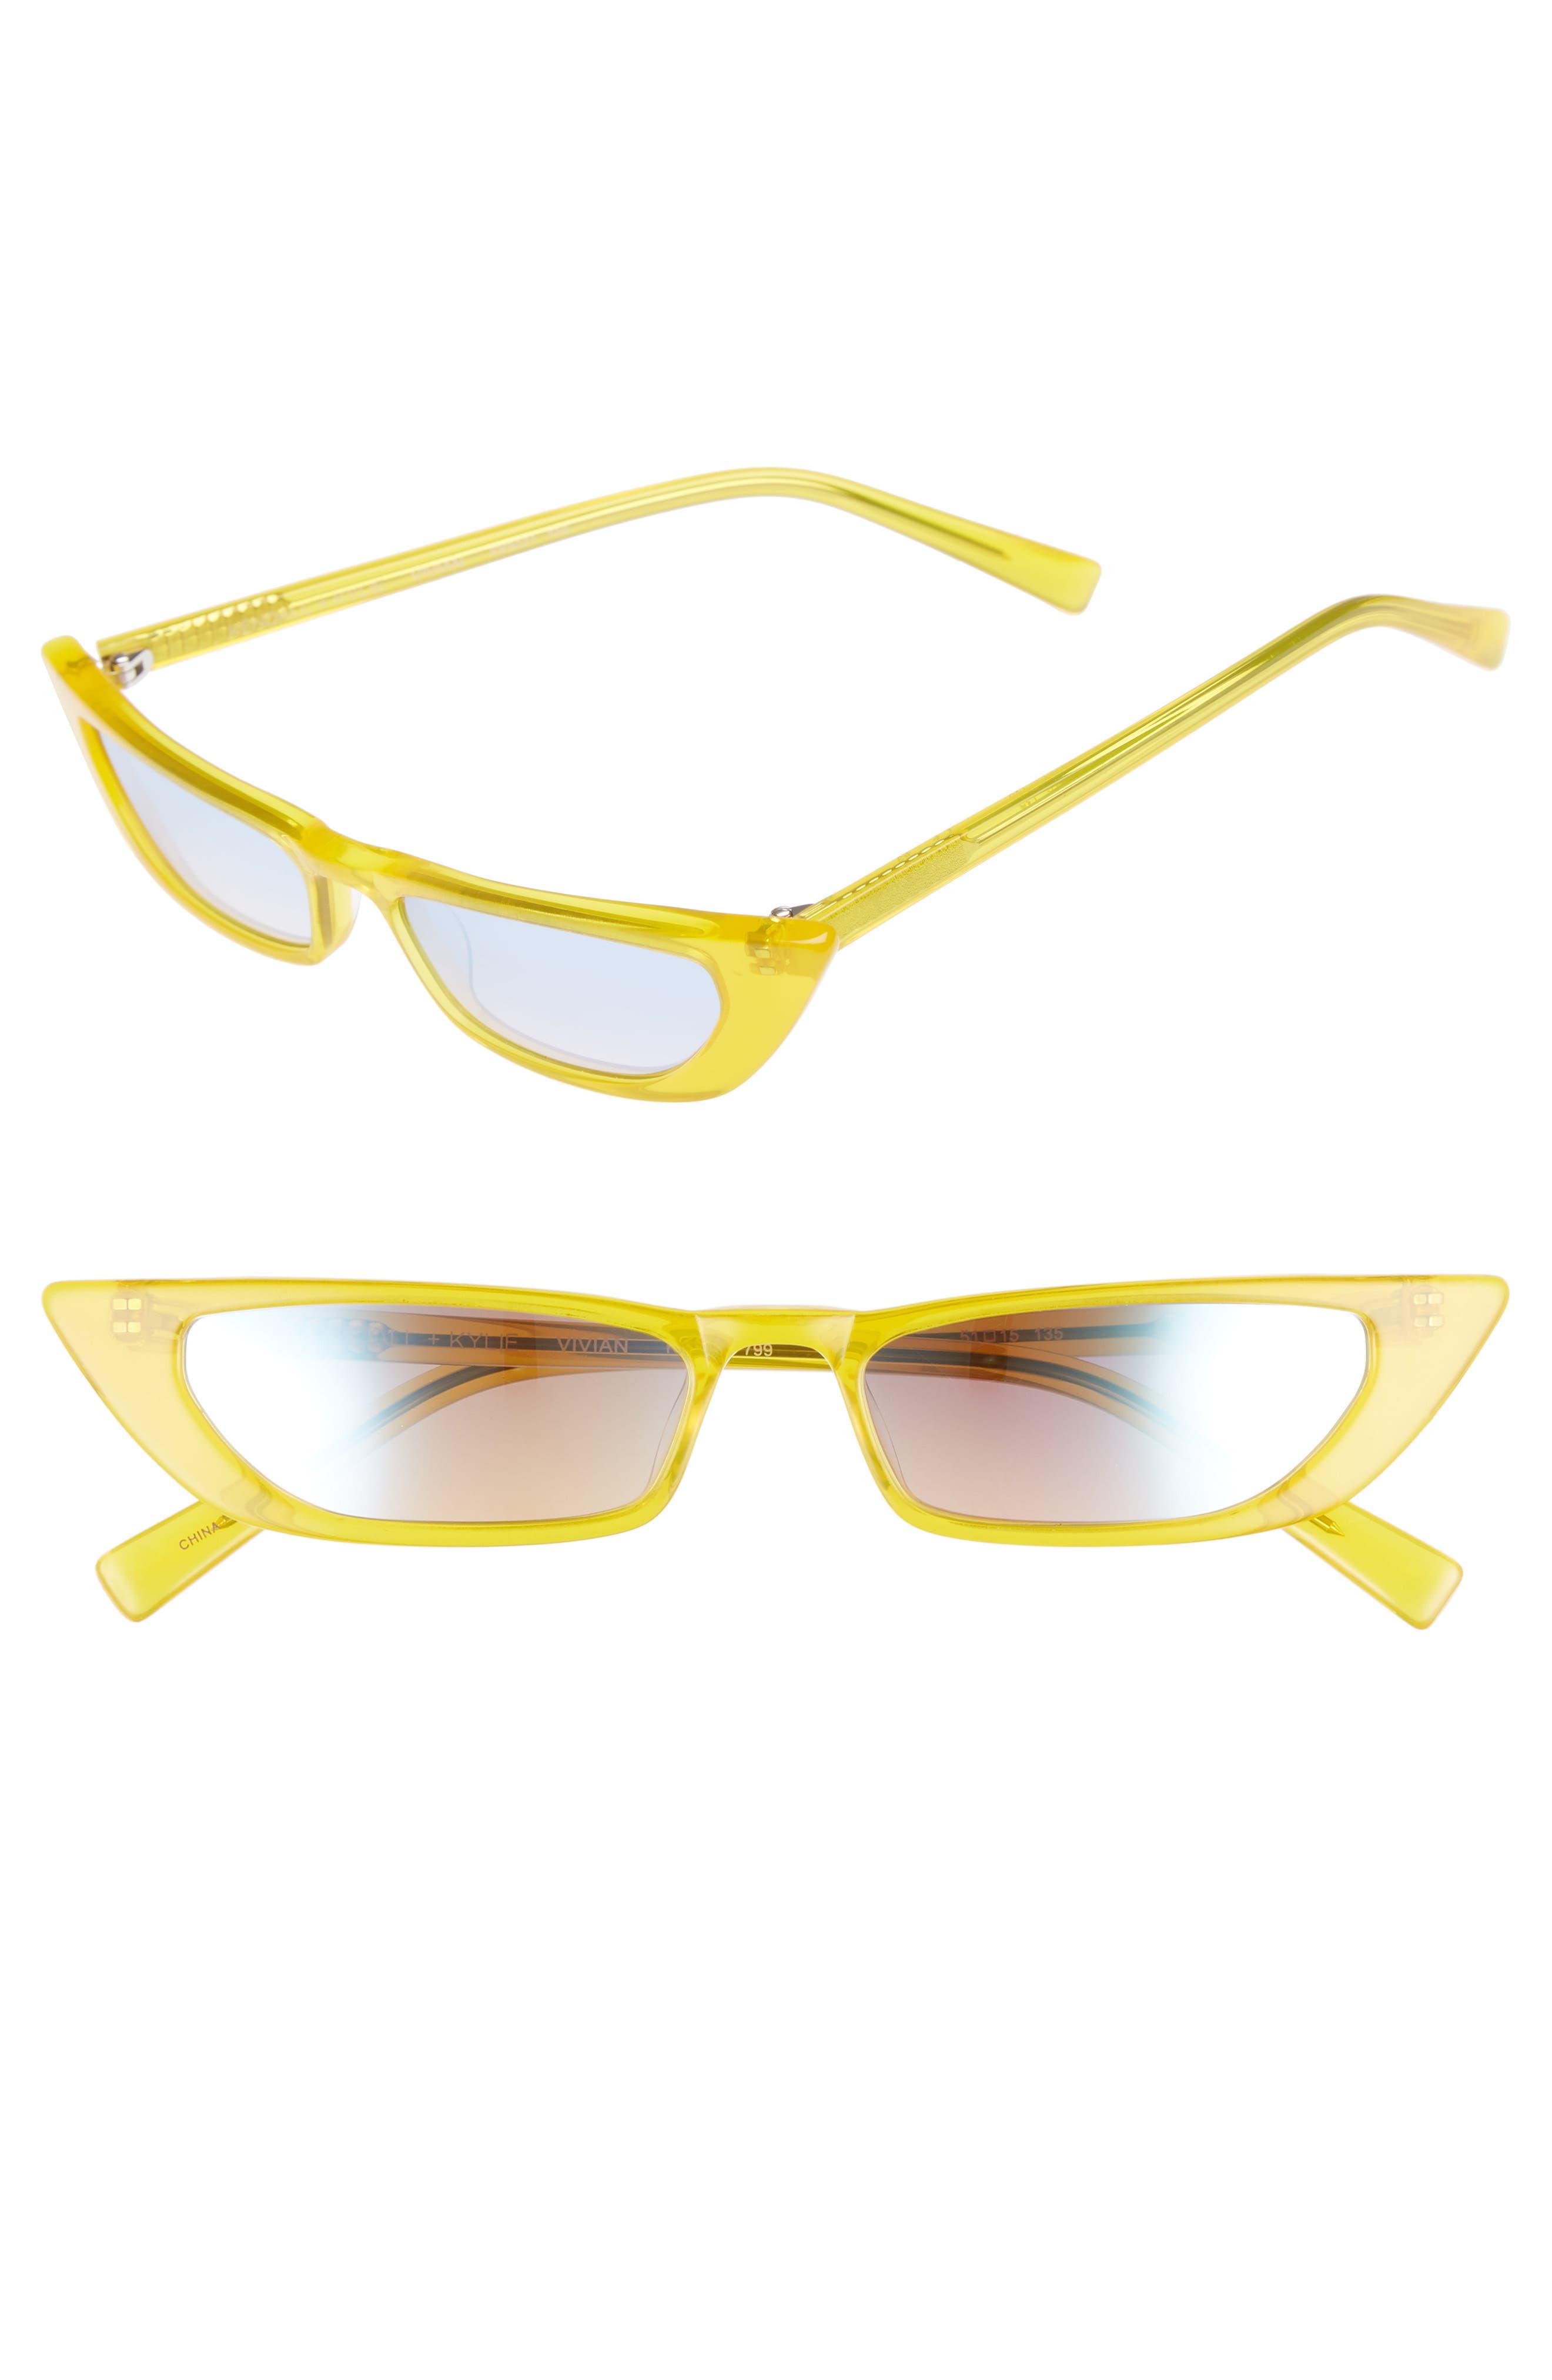 Kendall + Kylie Vivian Extreme 51Mm Cat Eye Sunglasses - Sun City Yellow/ Solid Smoke